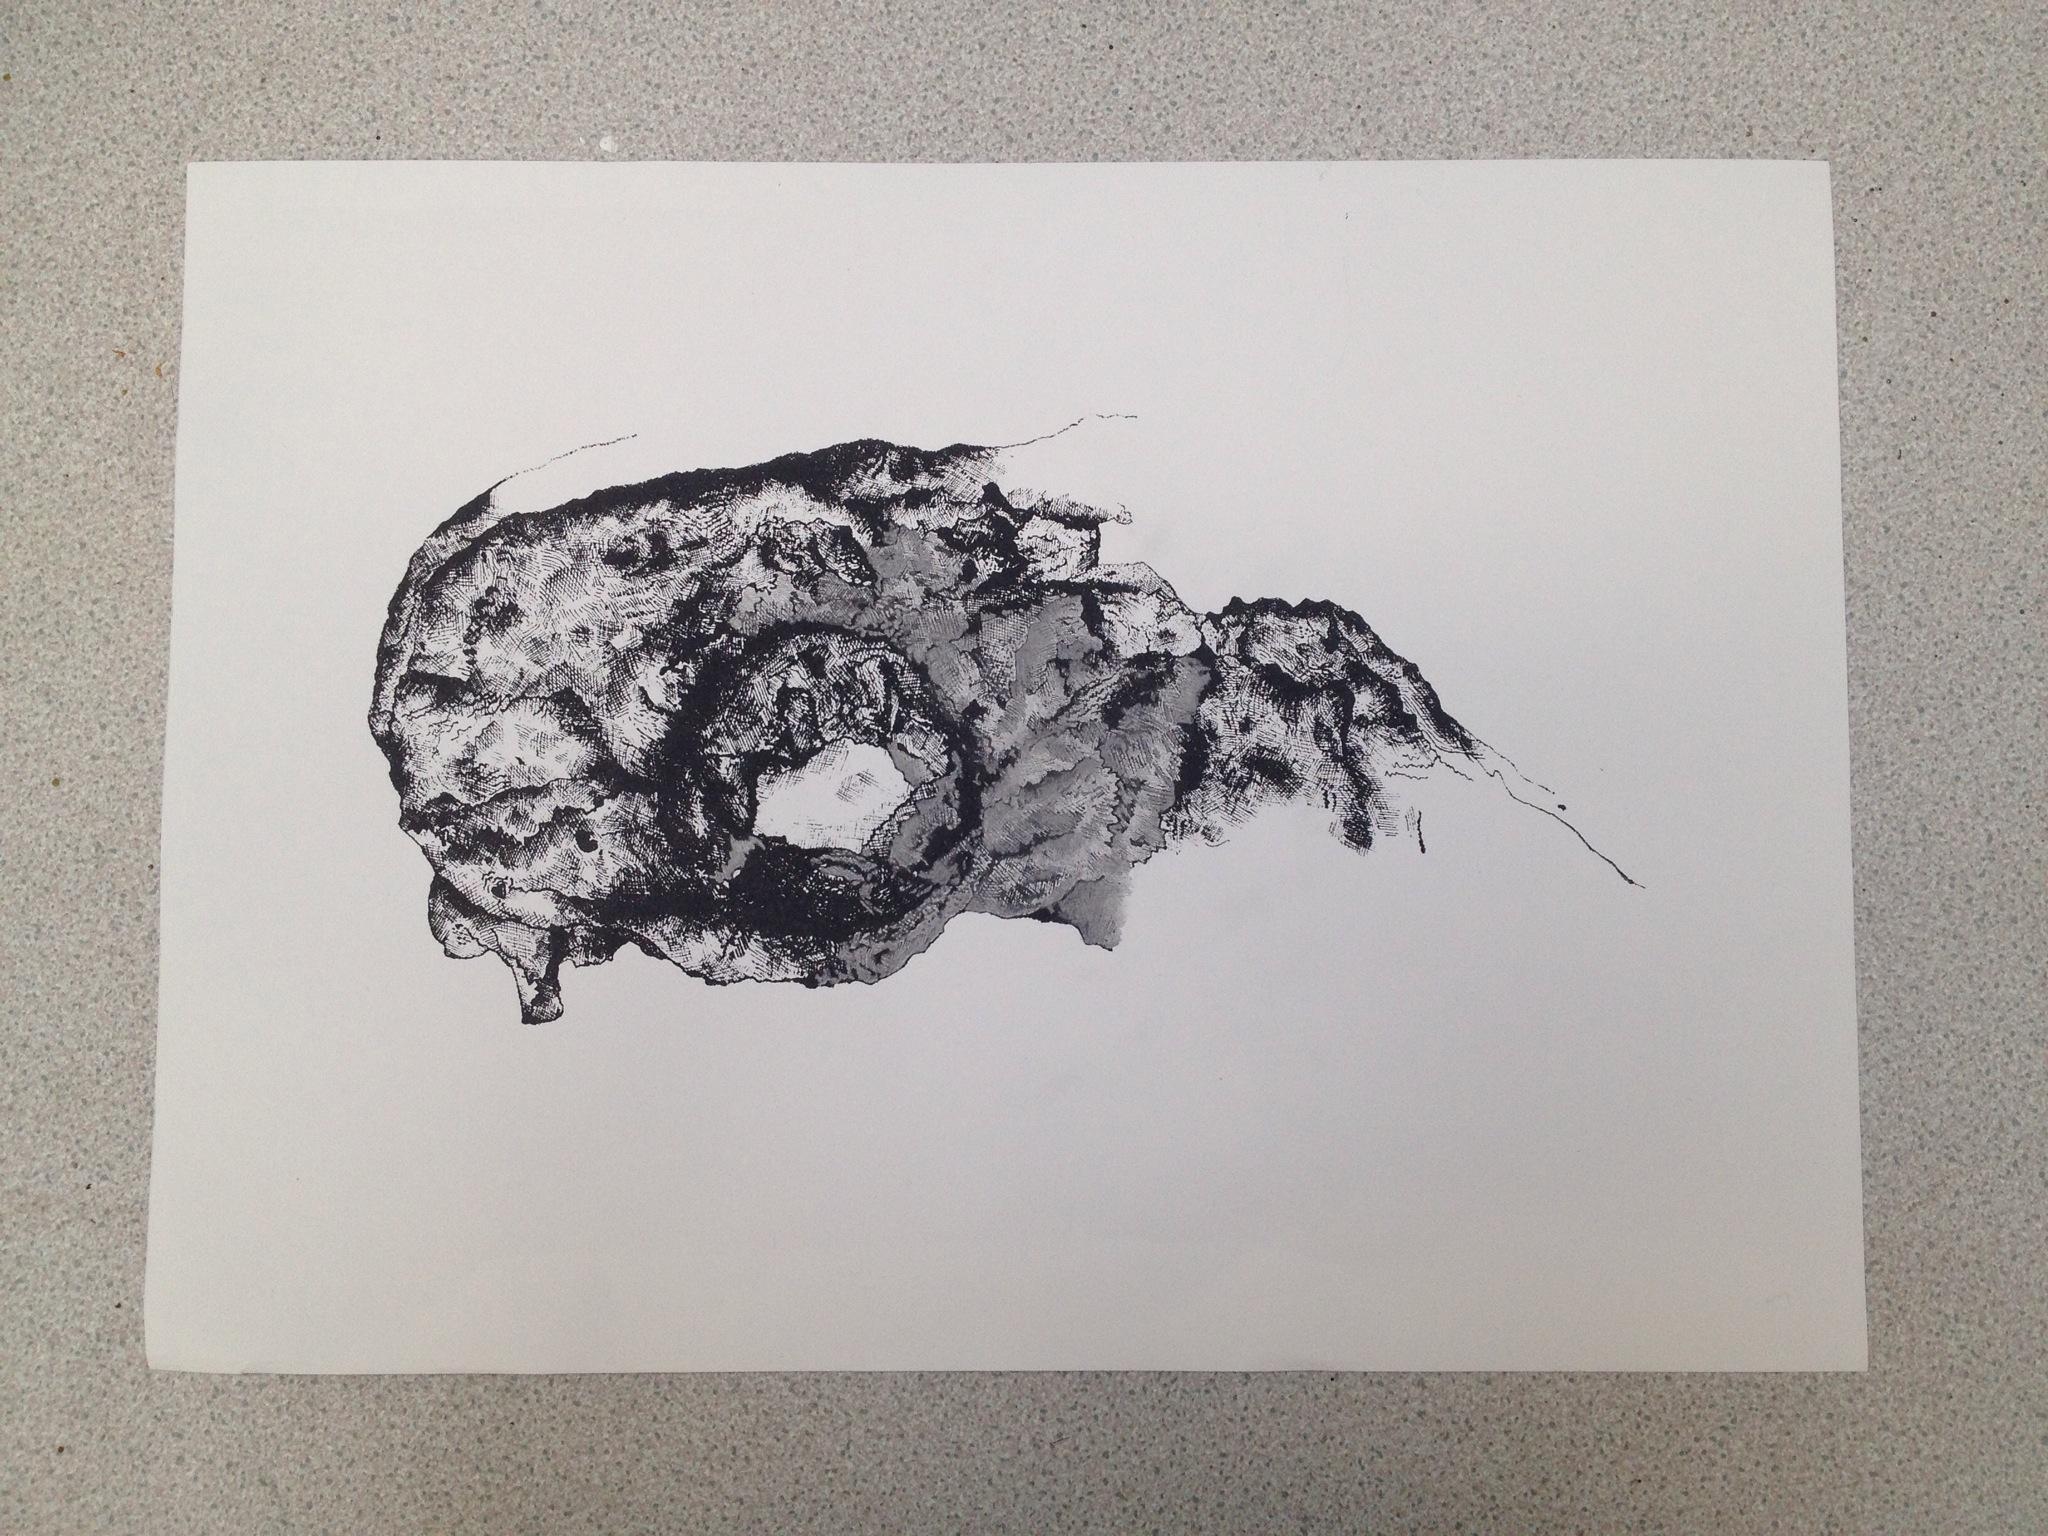 2048x1536 Skull Screen Print Francesrosetredget